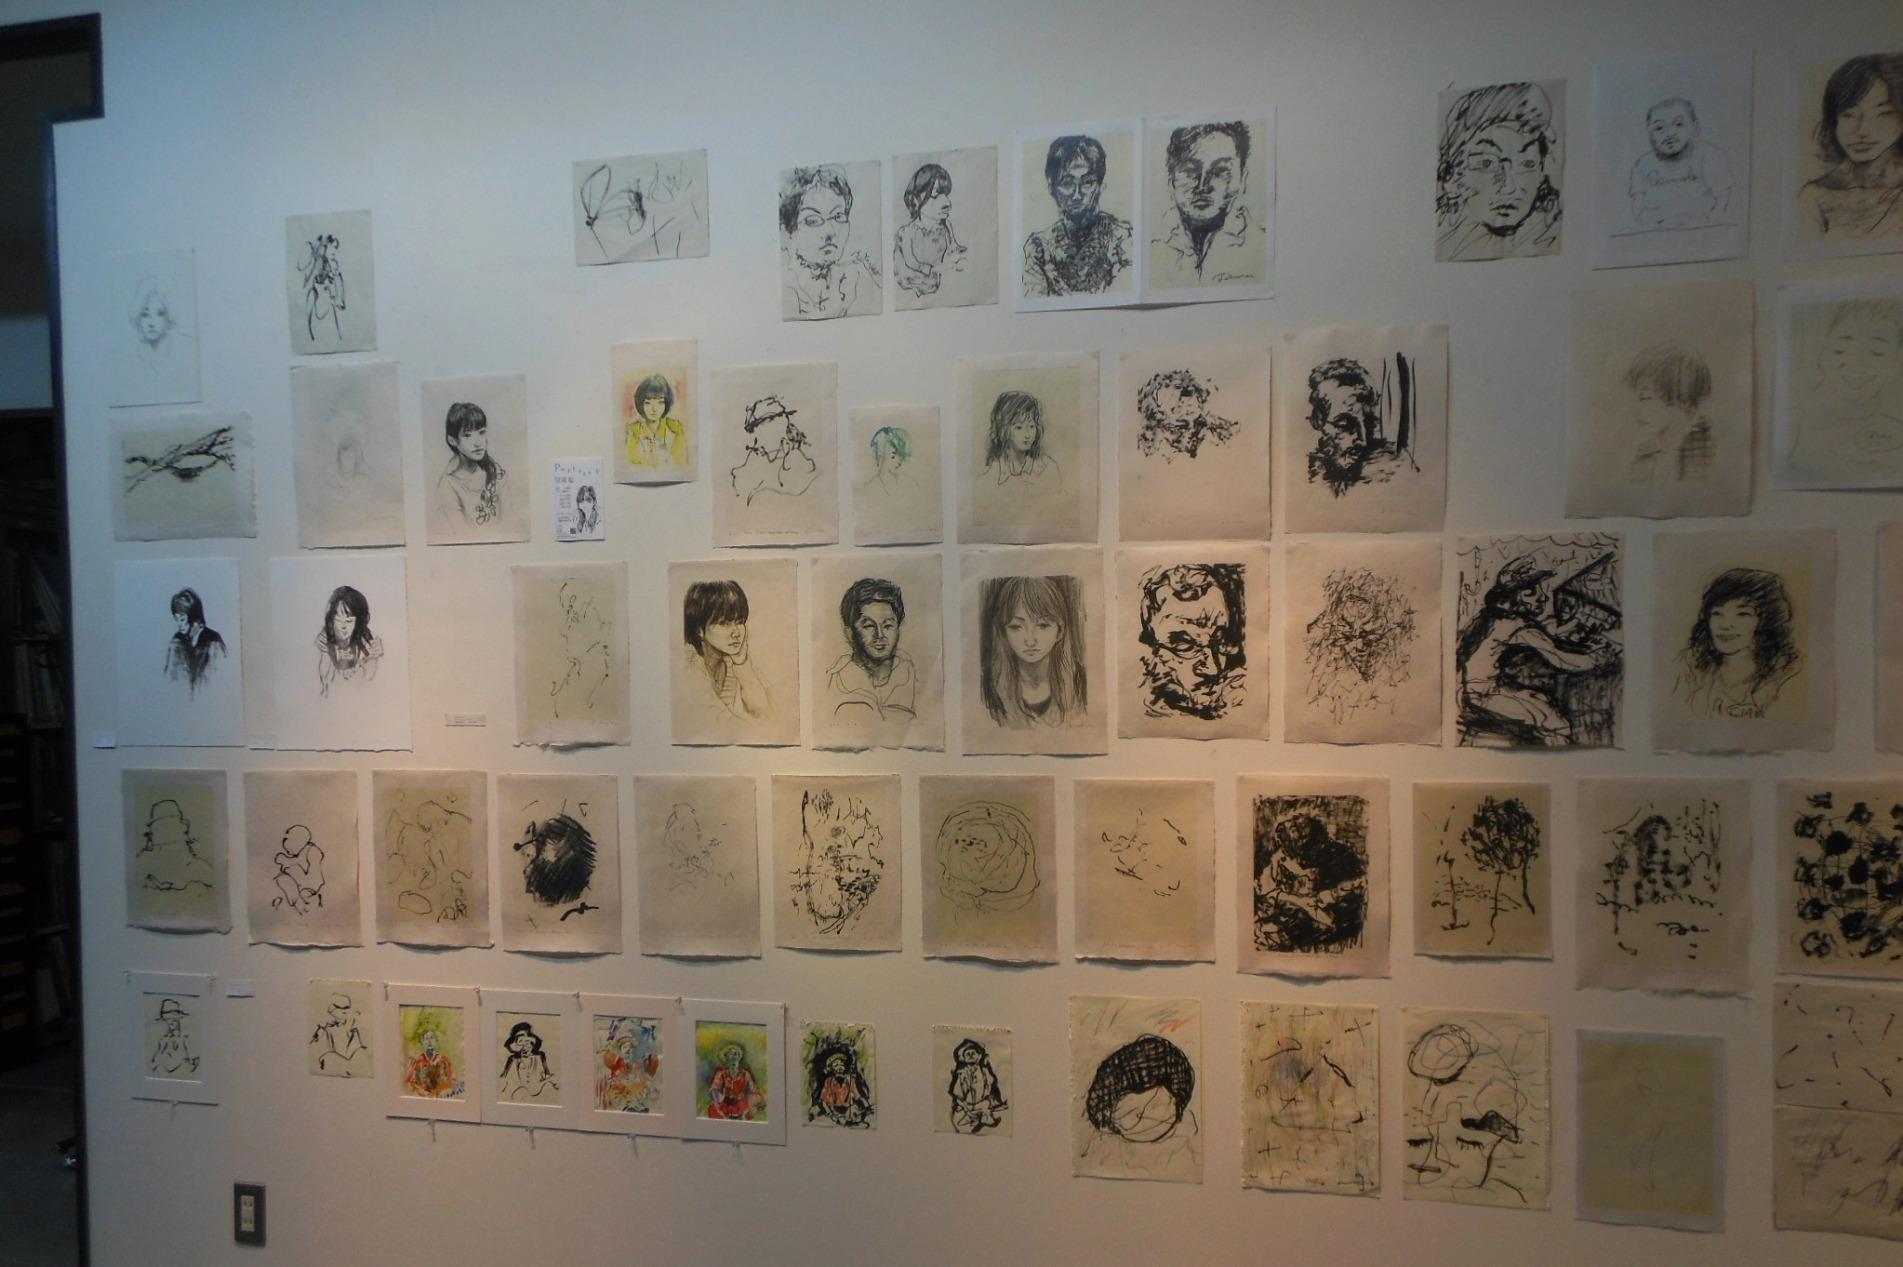 1650) 「栗田健・絵画展 『Portrait』」 af 終了・2月21日(火)~3月5日(月)_f0126829_1637269.jpg